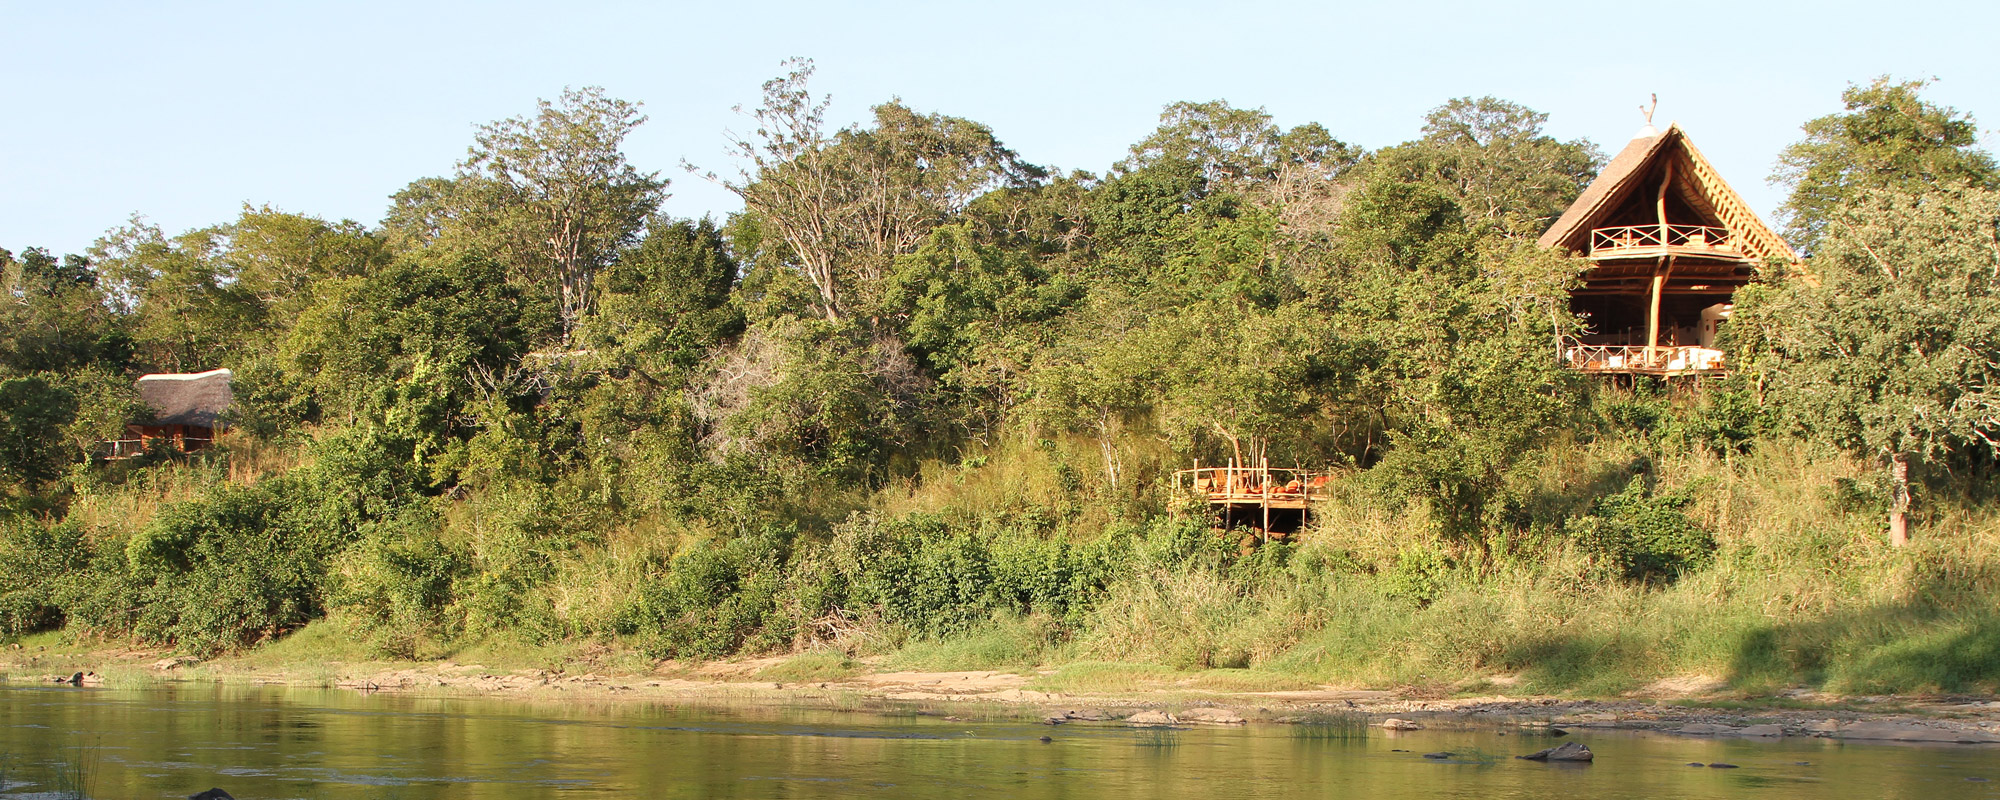 Tongole Wilderness Lodge - African Safari